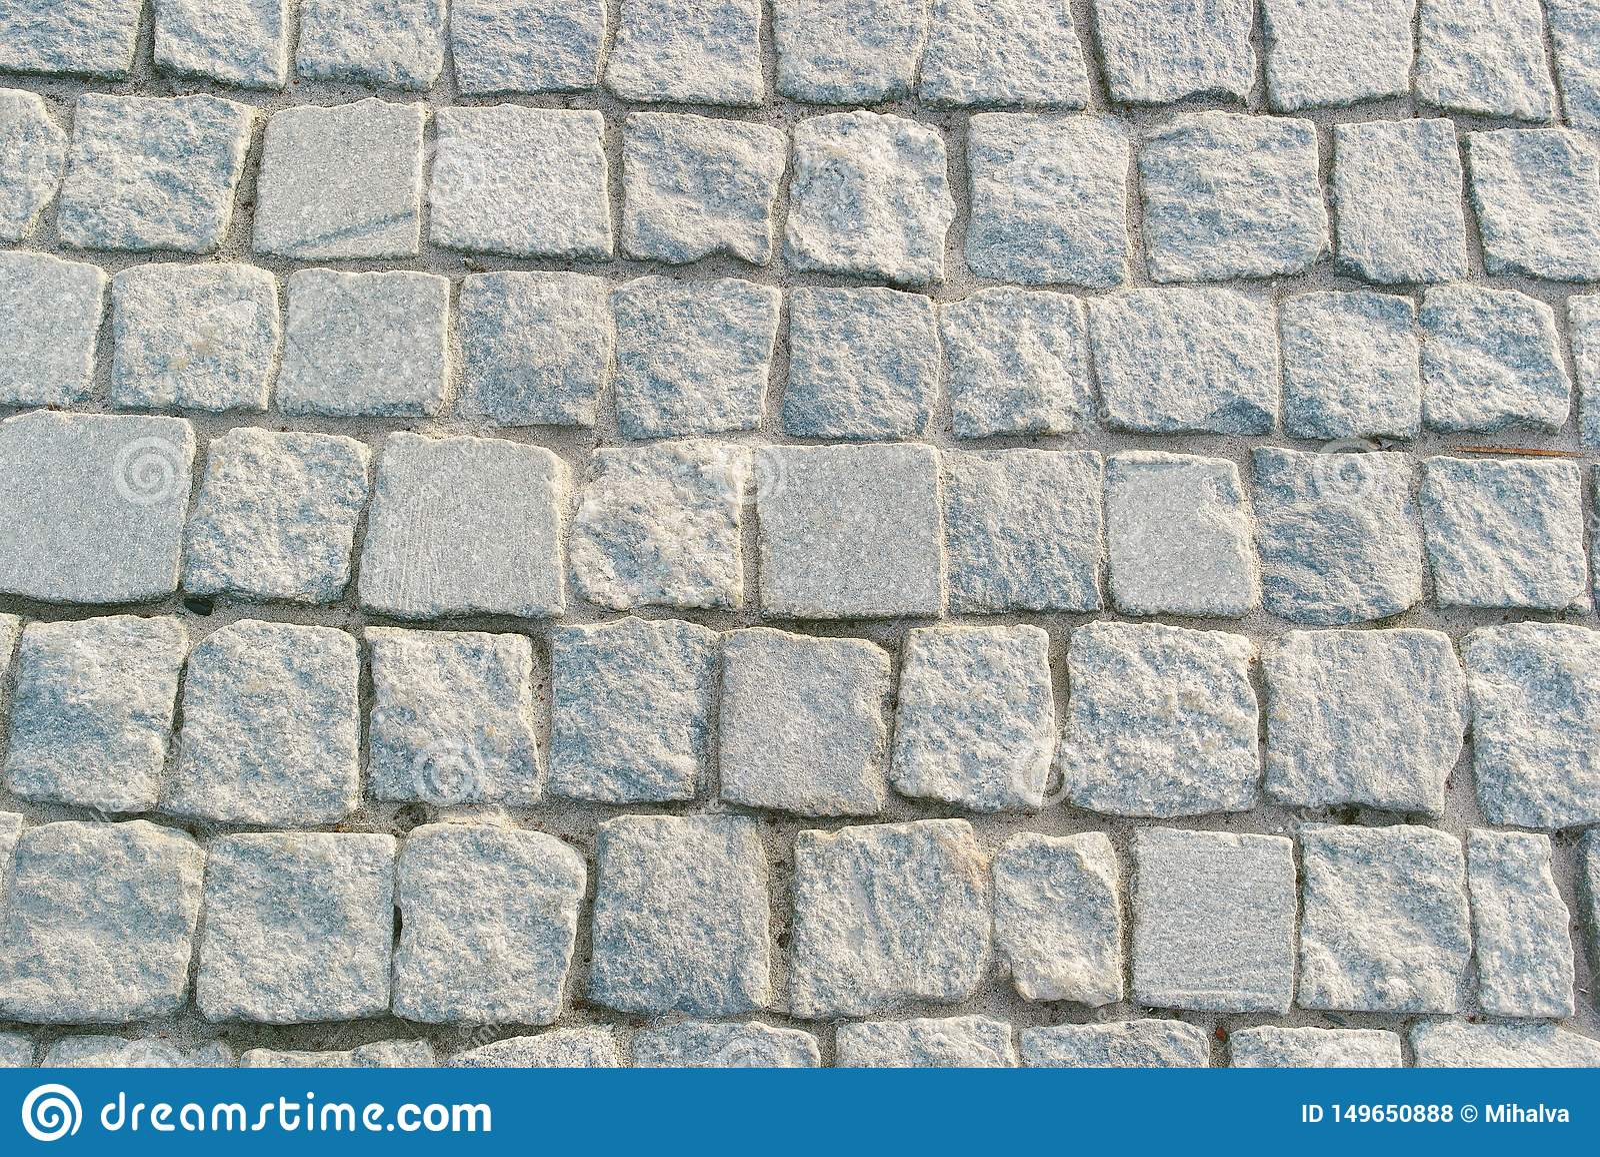 Gray paving stones on road